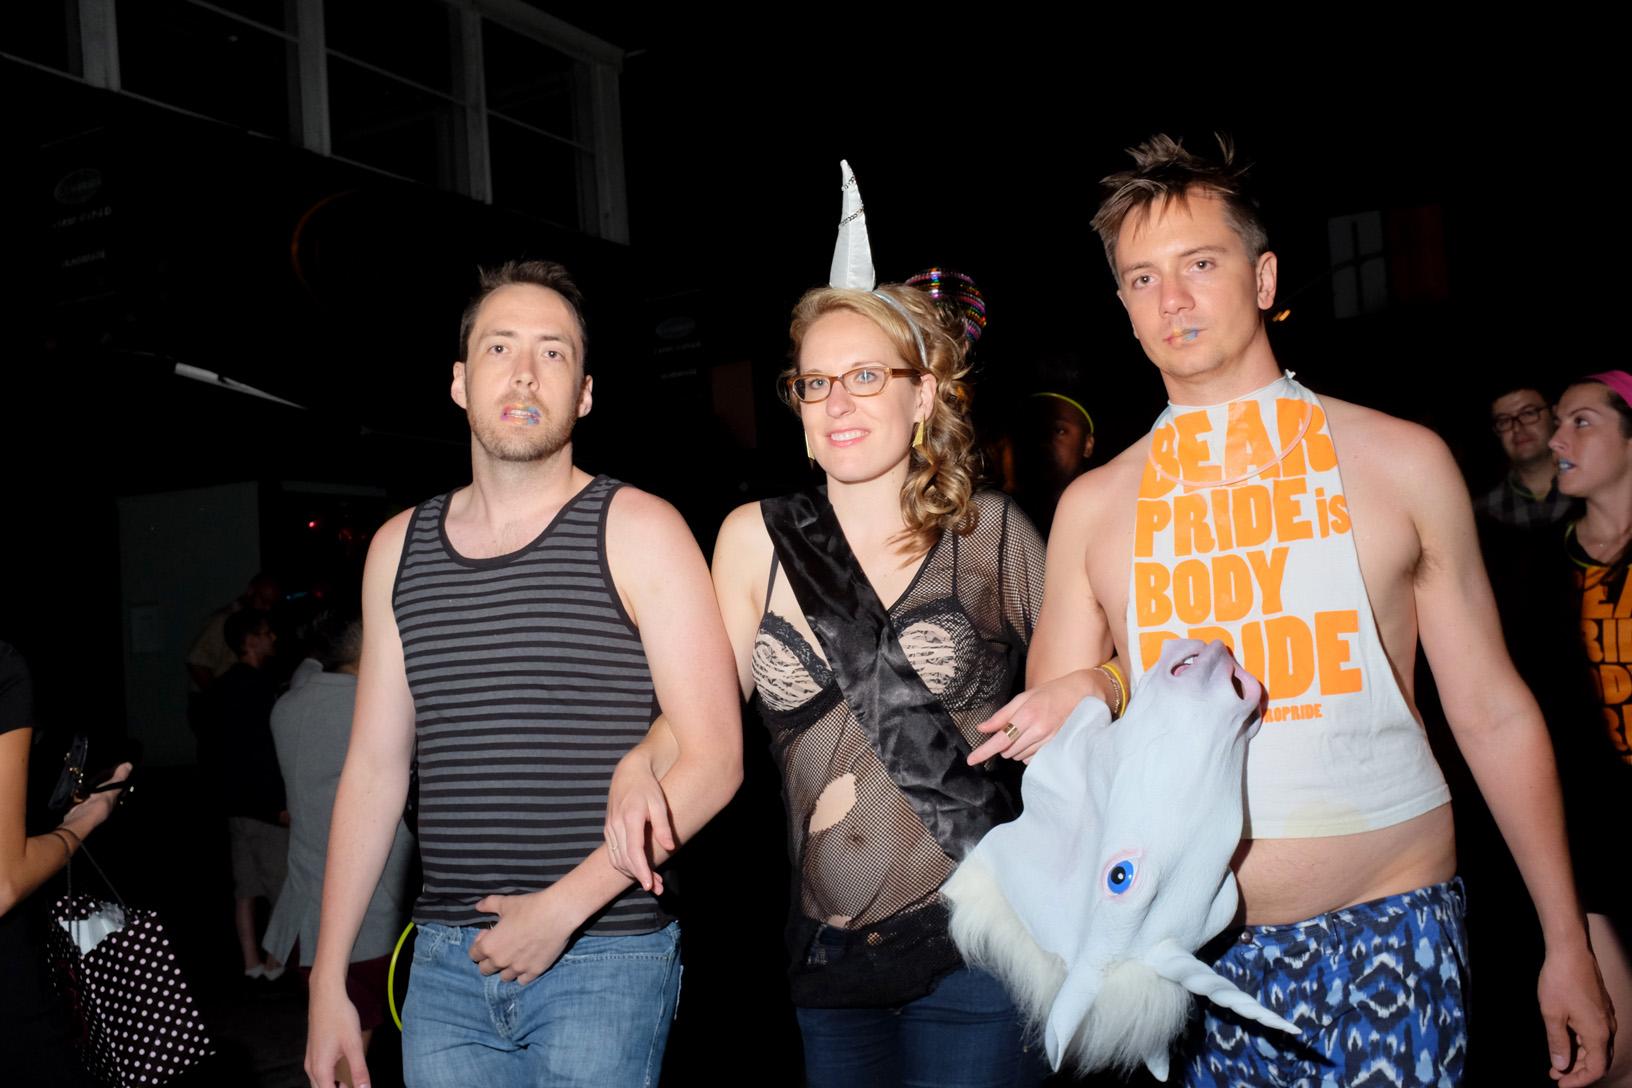 World Pride-Toronto-2014-100dpi-5.jpg